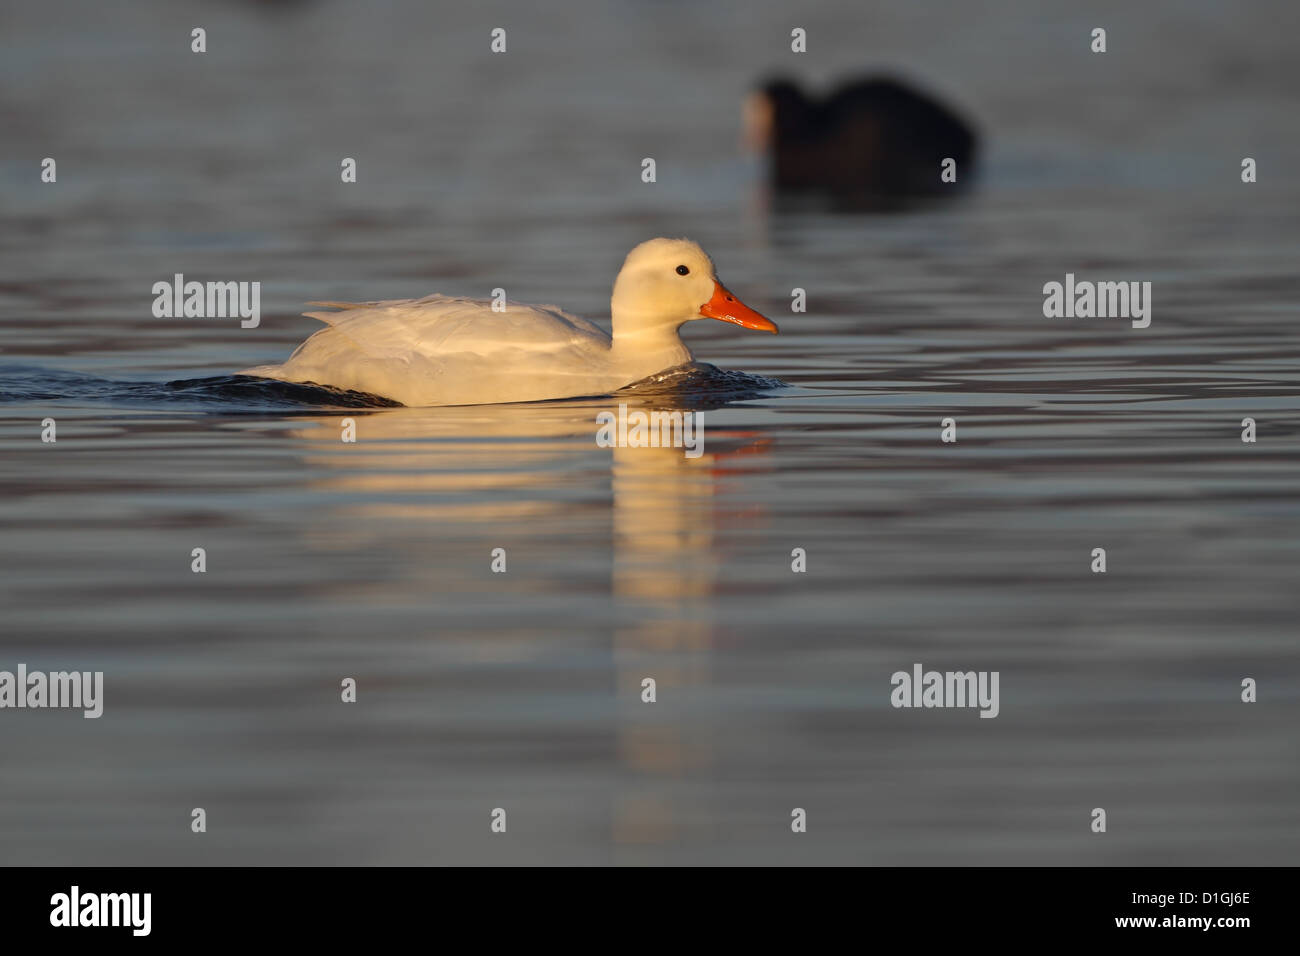 Pekin Aylesbury Duck Mallard (Anas platyrhynchos) - Stock Image